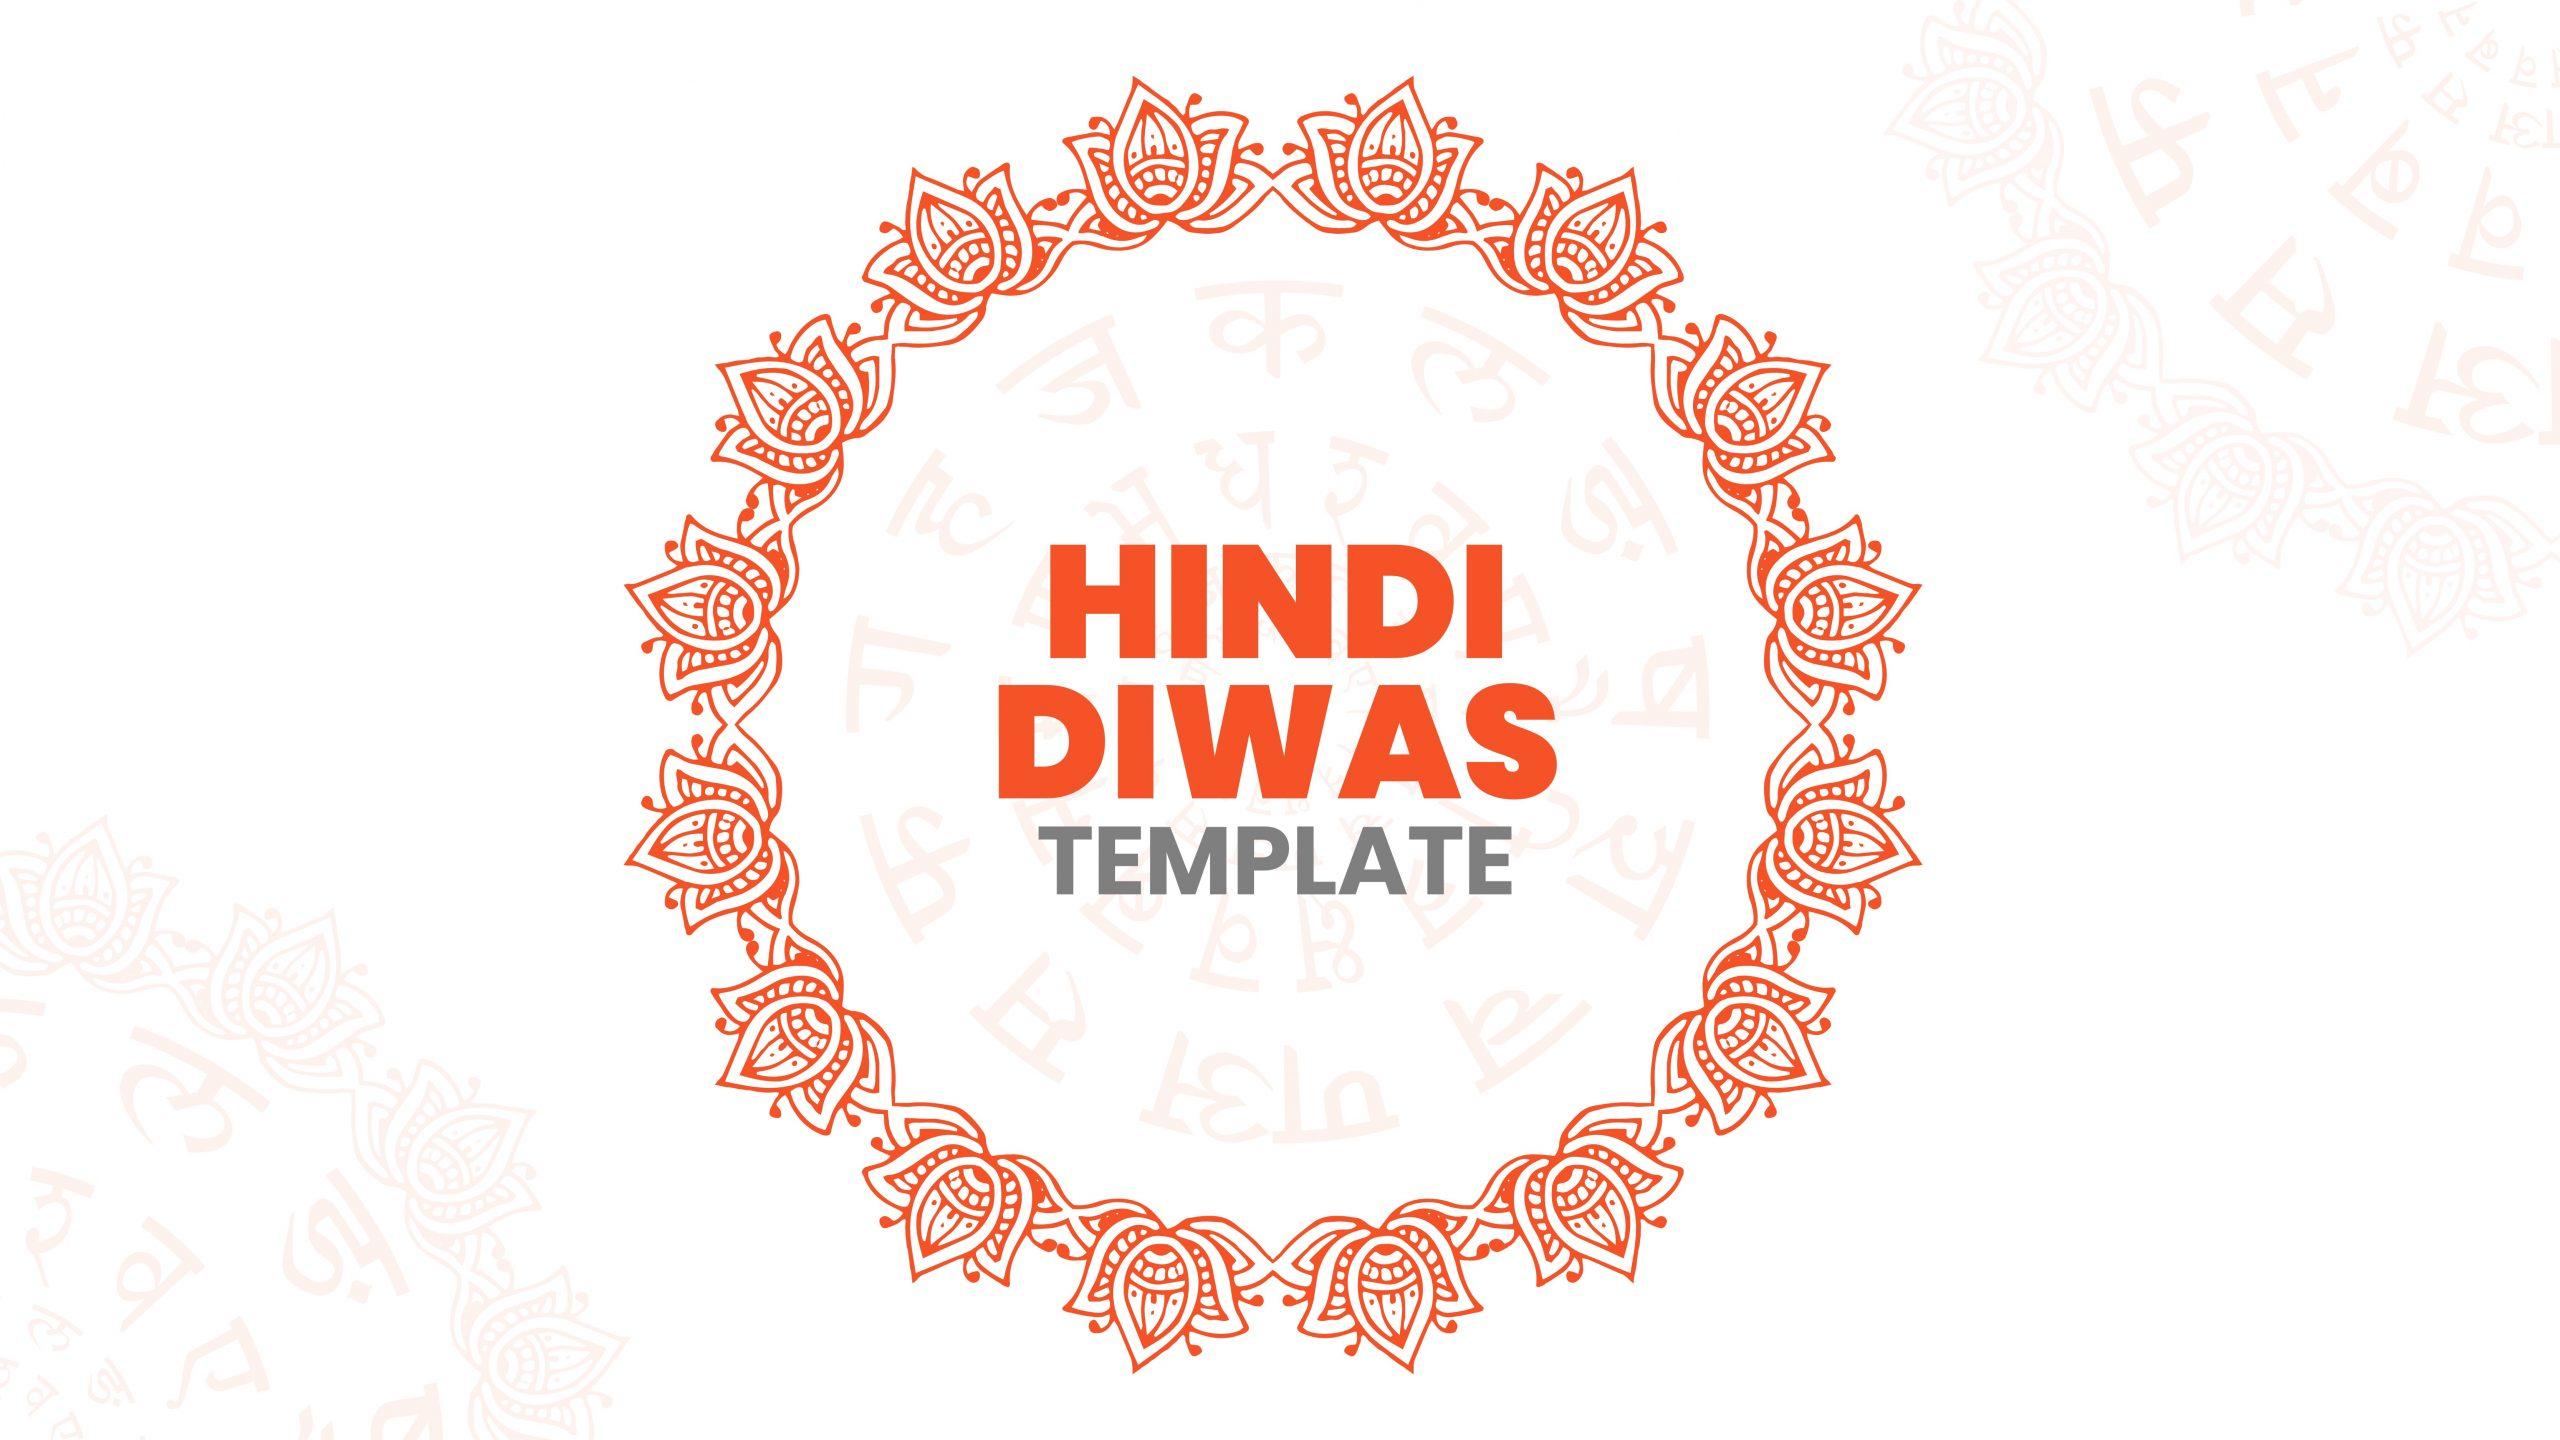 presentation template of Hindi Diwas